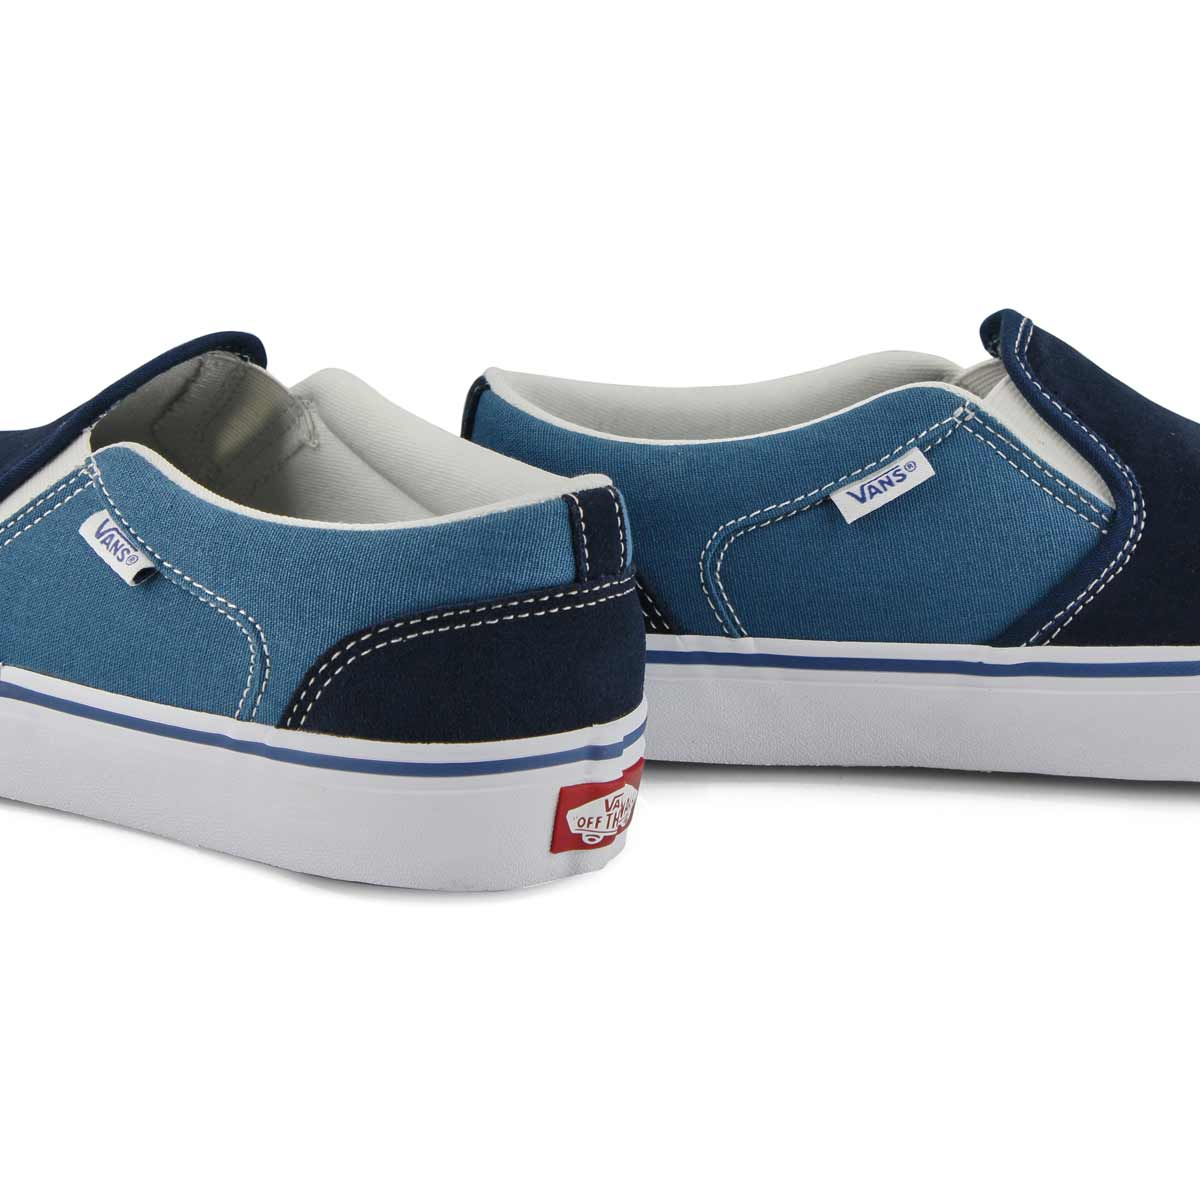 Men's Asher Sneaker - Navy/Moroccan Blue